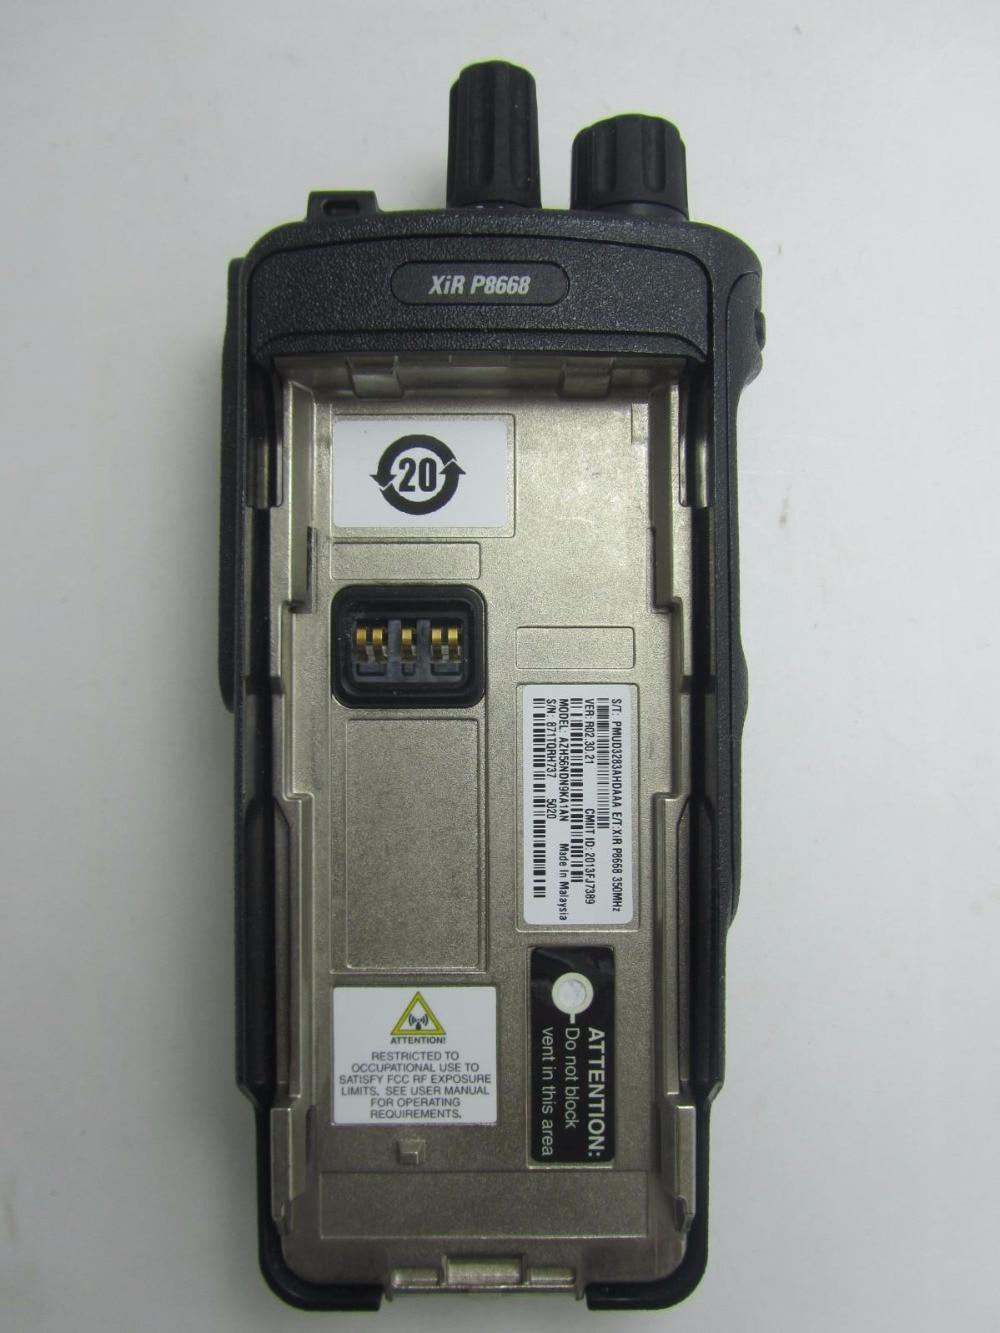 portable walkie talkie dual band xir p8668 motorola two way radio rh aliexpress com Alcatel One Touch Manual Garmin GPS Manual